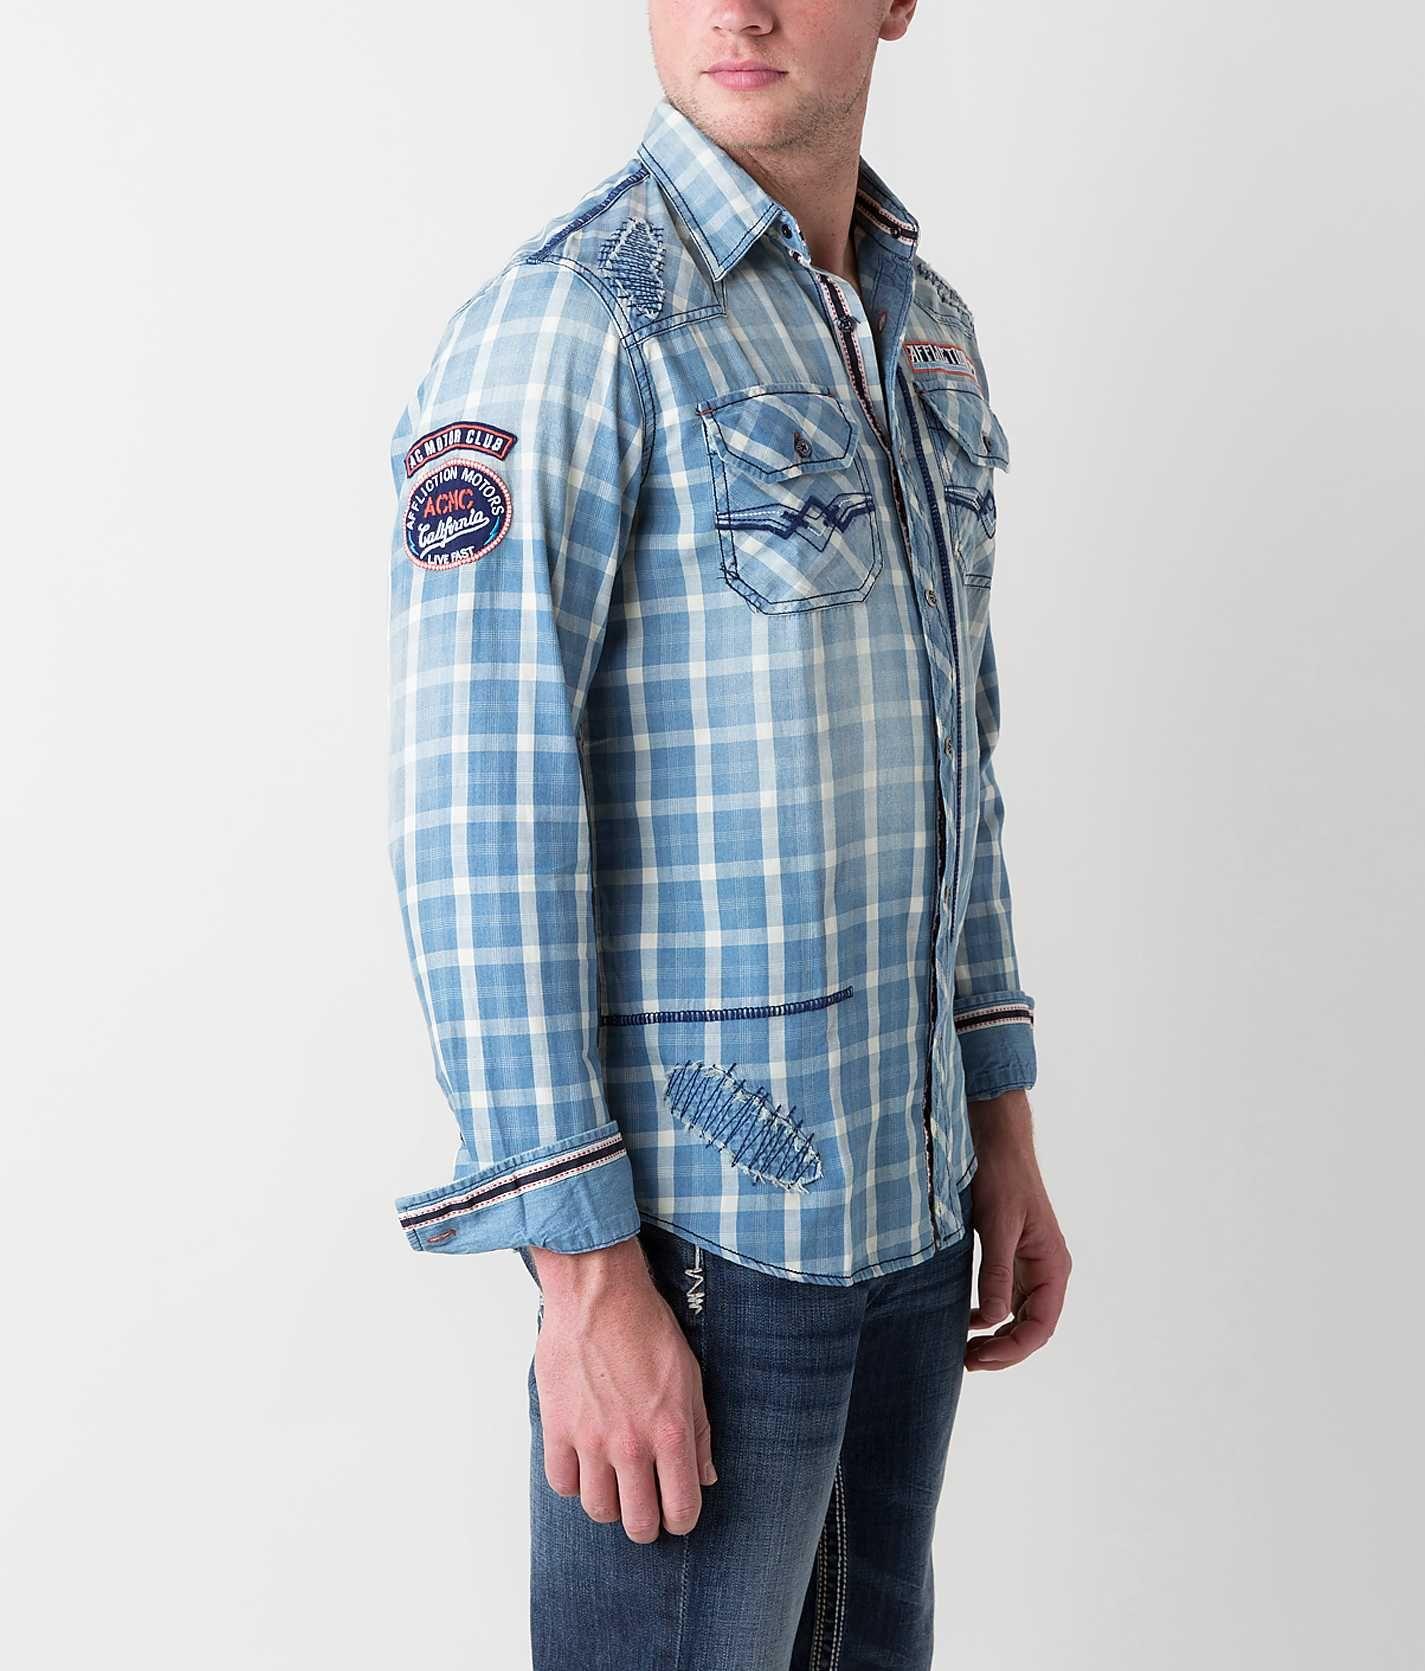 Affliction Black Premium First Ascent Shirt - Men's Tops   Buckle